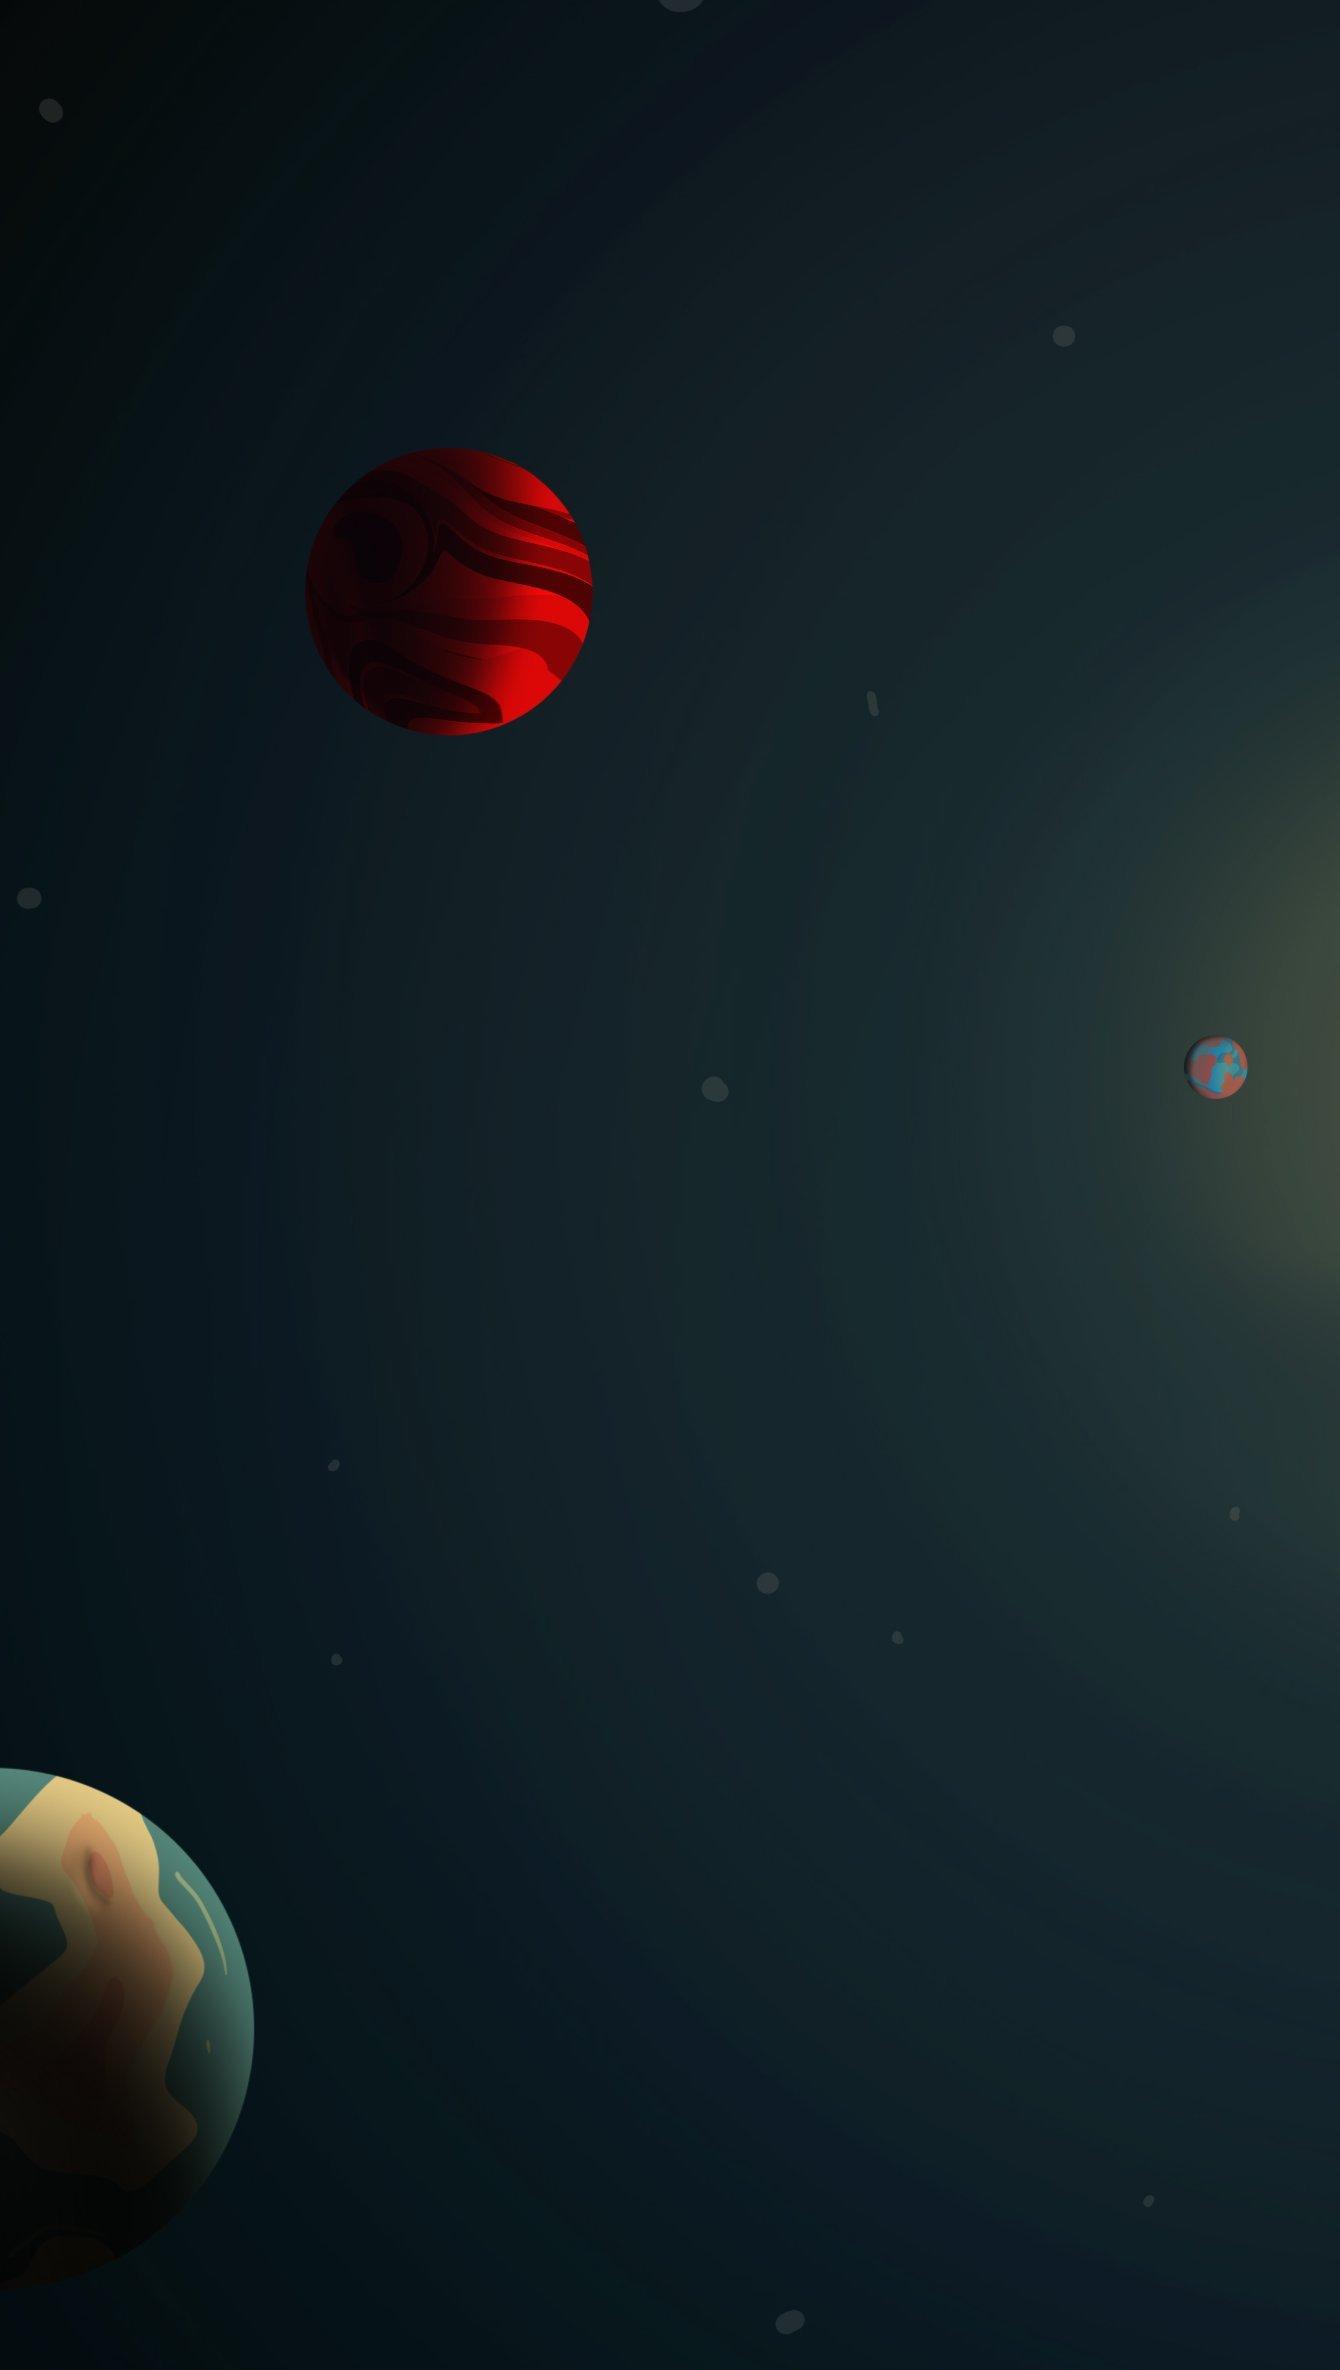 Fondos de pantalla Ilustración de planetas Vertical